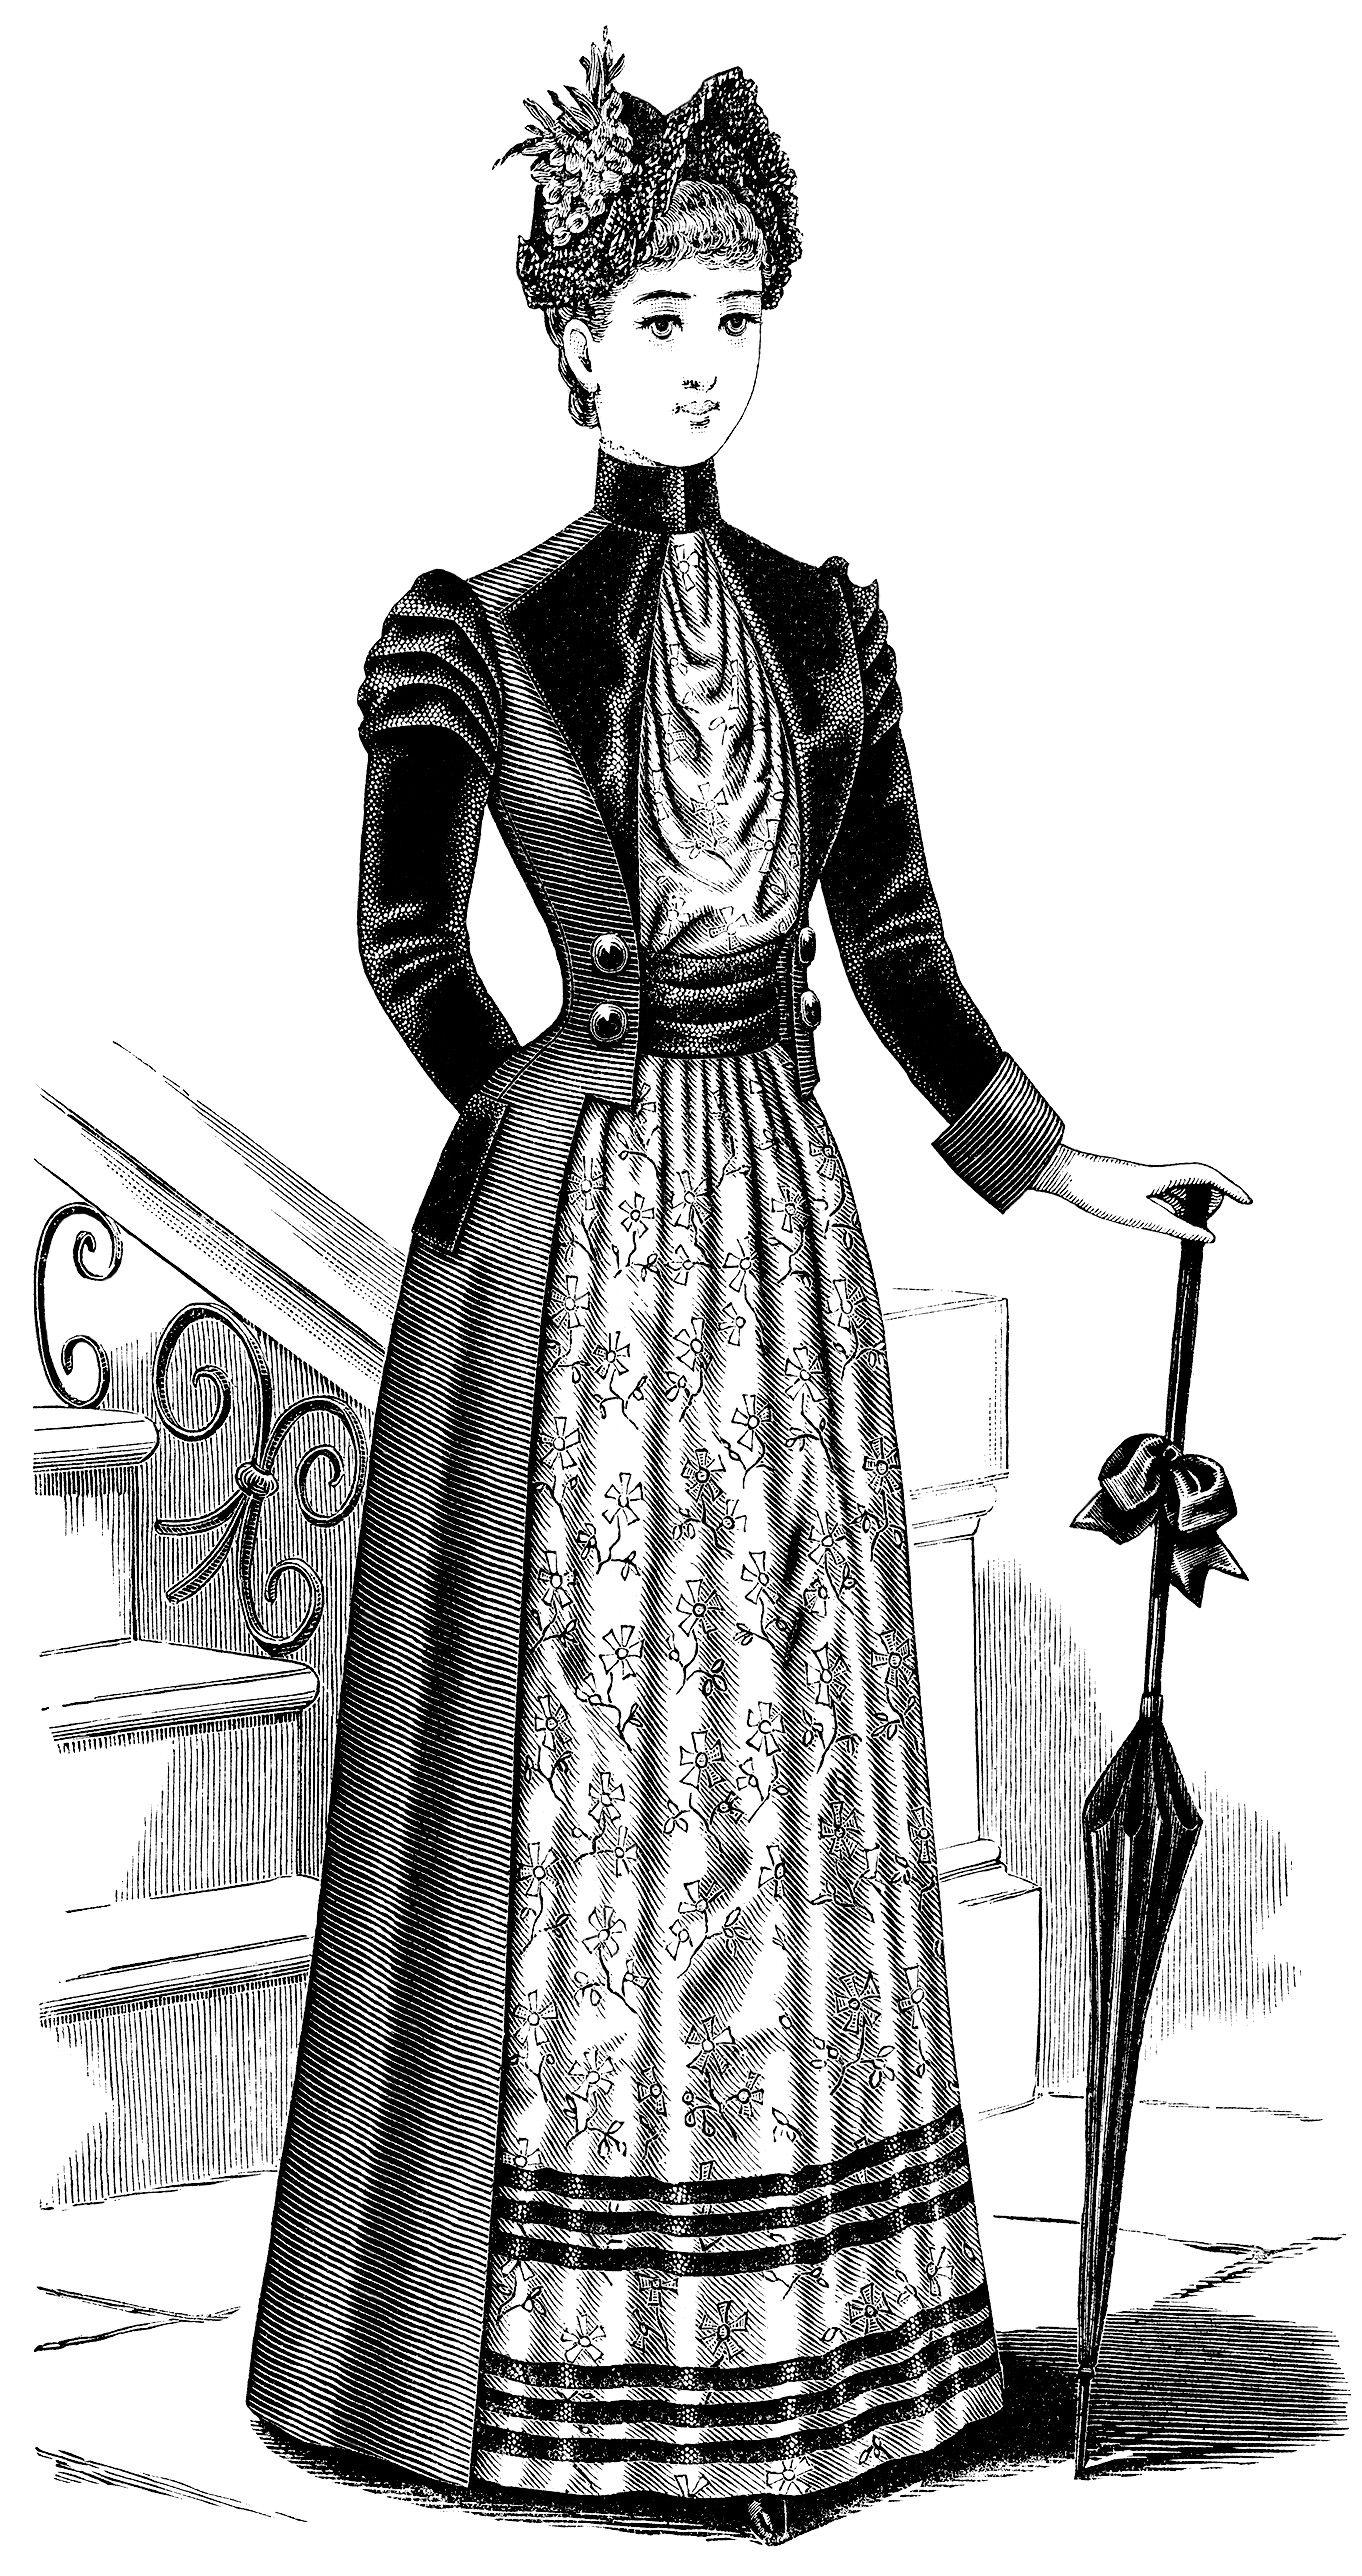 Victorian Ladies Toilette Free Clip Art Black And White Version Fashion Illustration Vintage Victorian Women Victorian Fashion